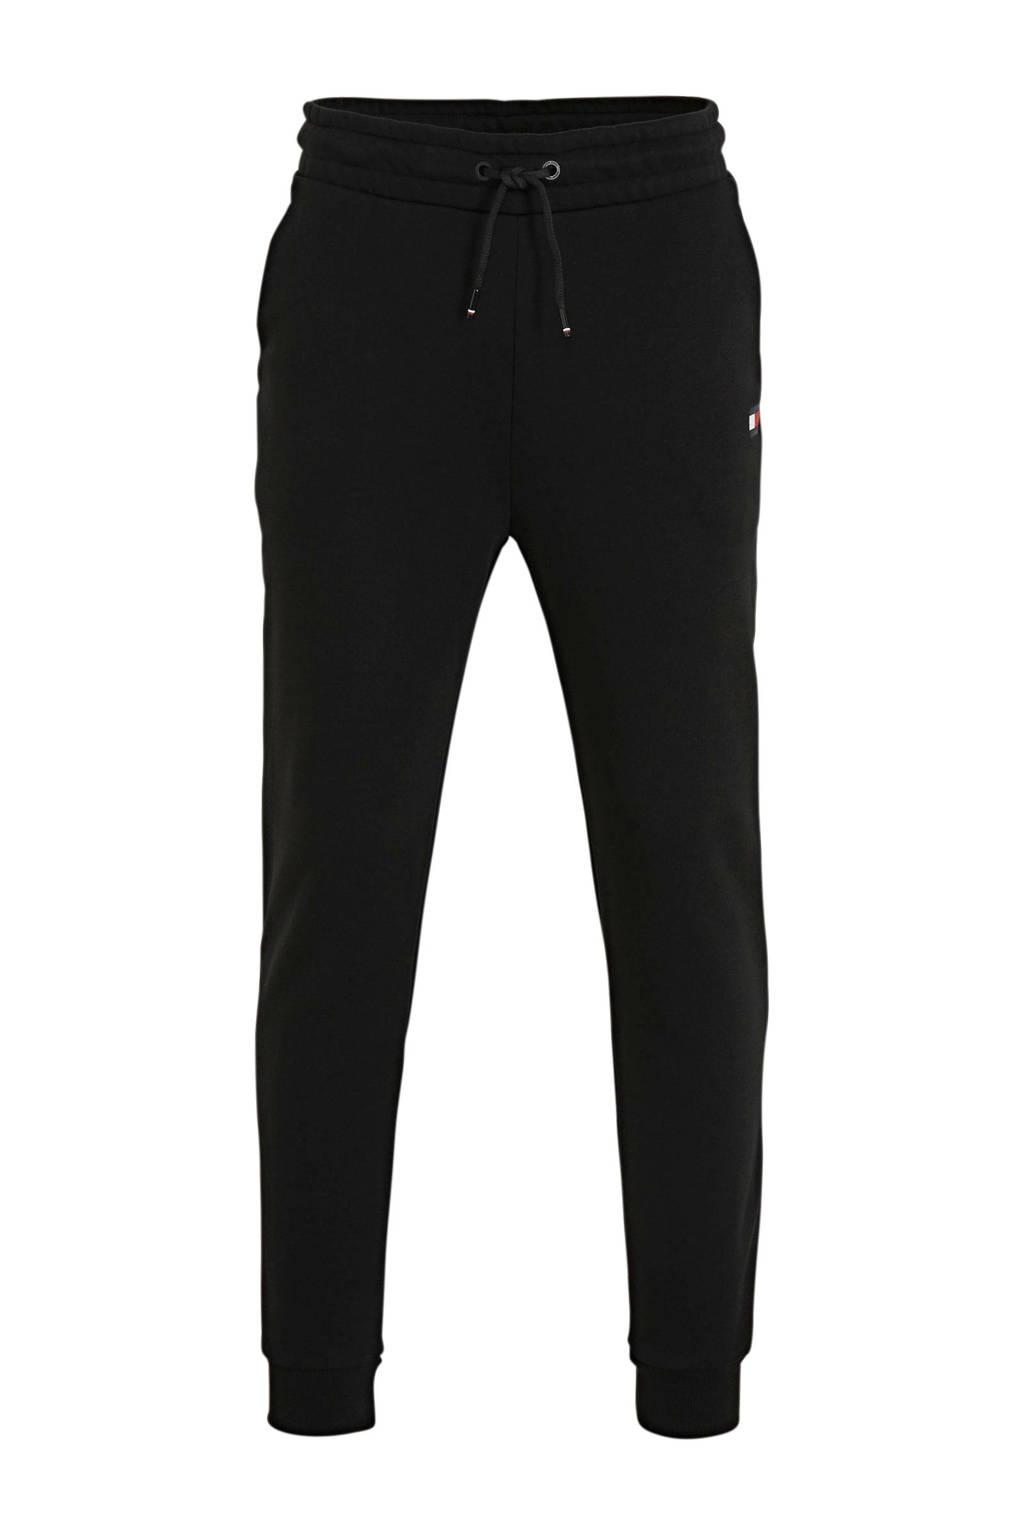 Tommy Hilfiger Sport joggingbroek zwart, Zwart